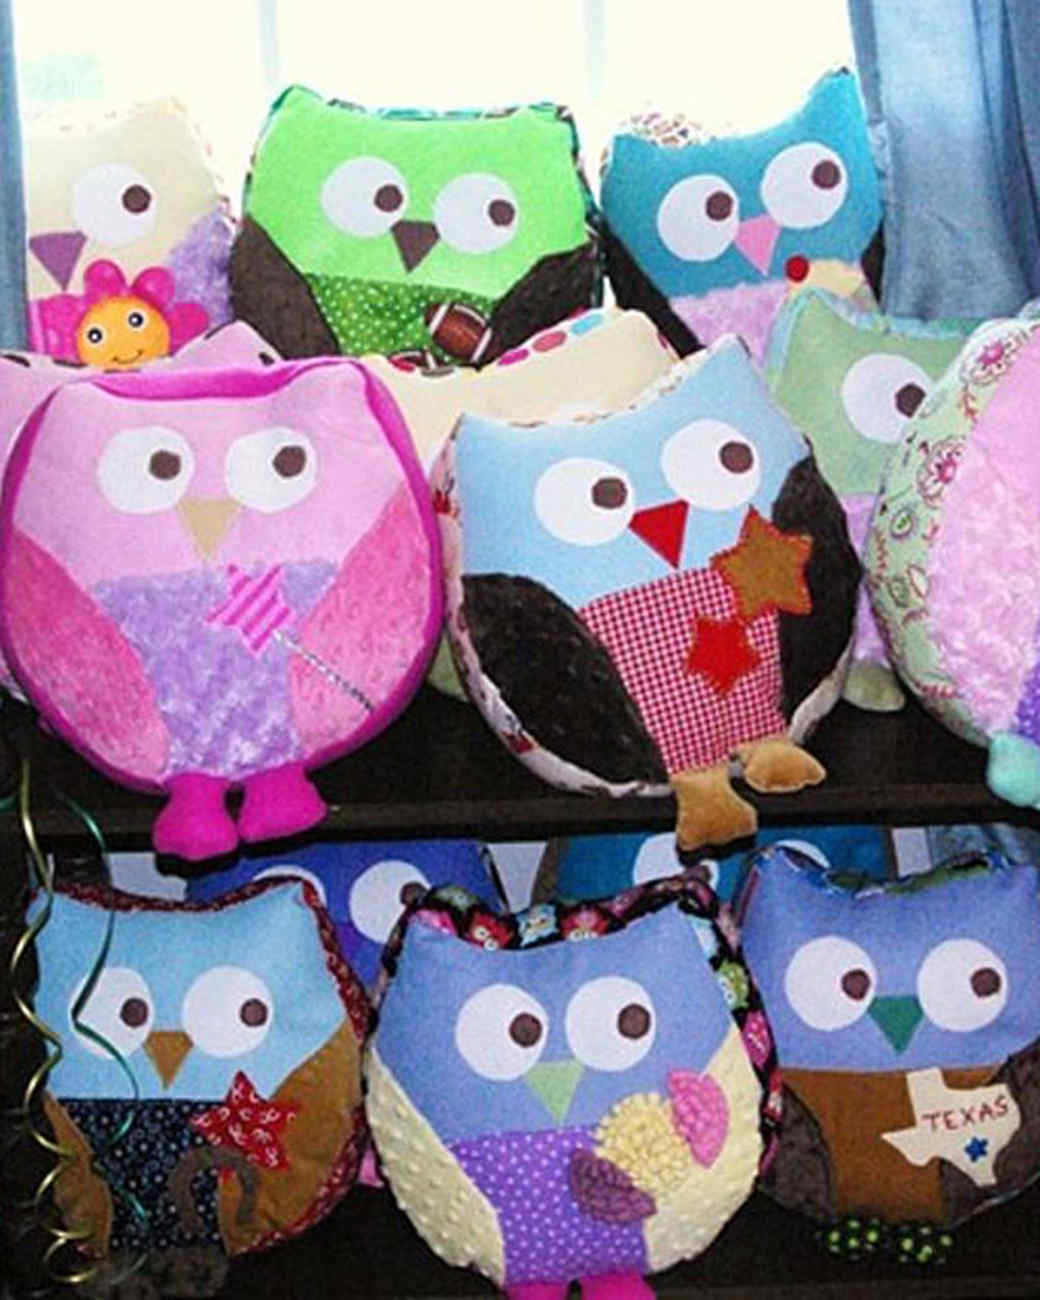 ms_celebrate_owl_pillows.jpg